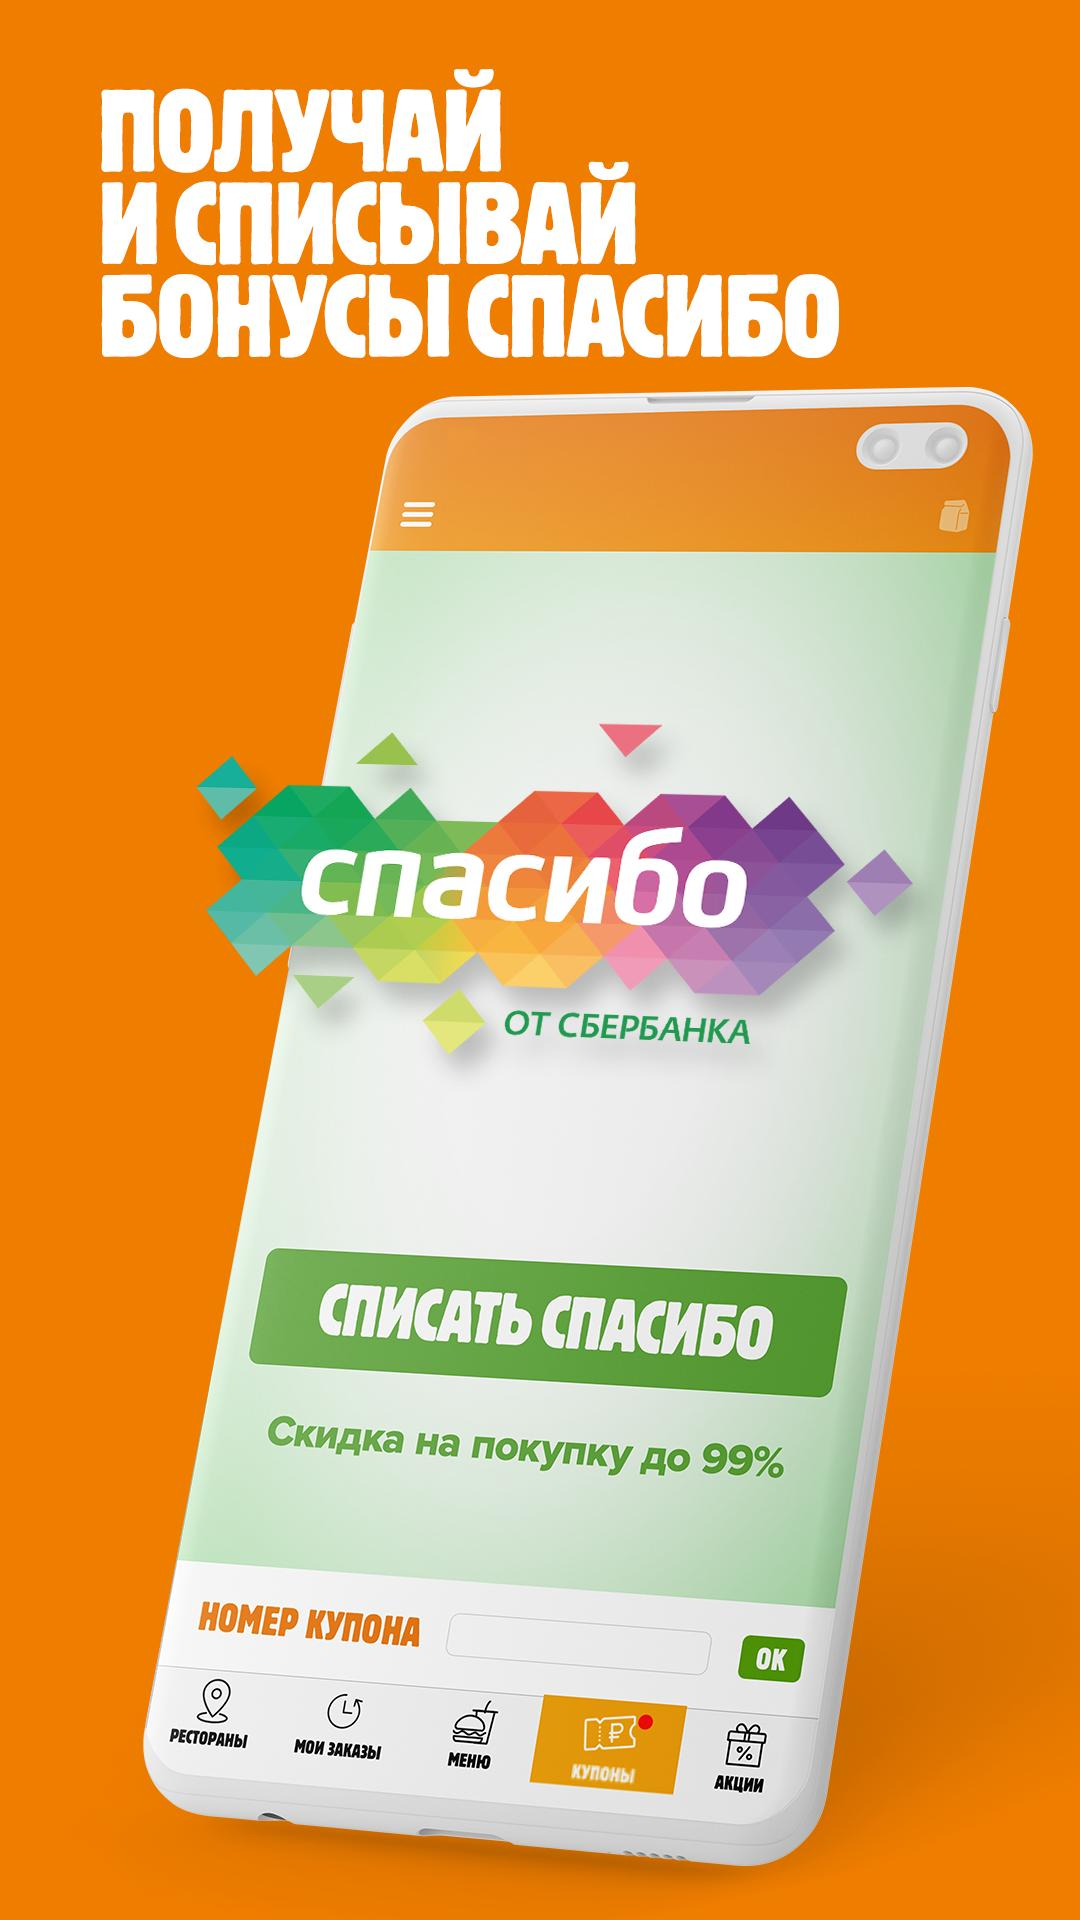 БУРГЕР КИНГ - 100 руб. за первый заказ 6.0.3 Screenshot 2